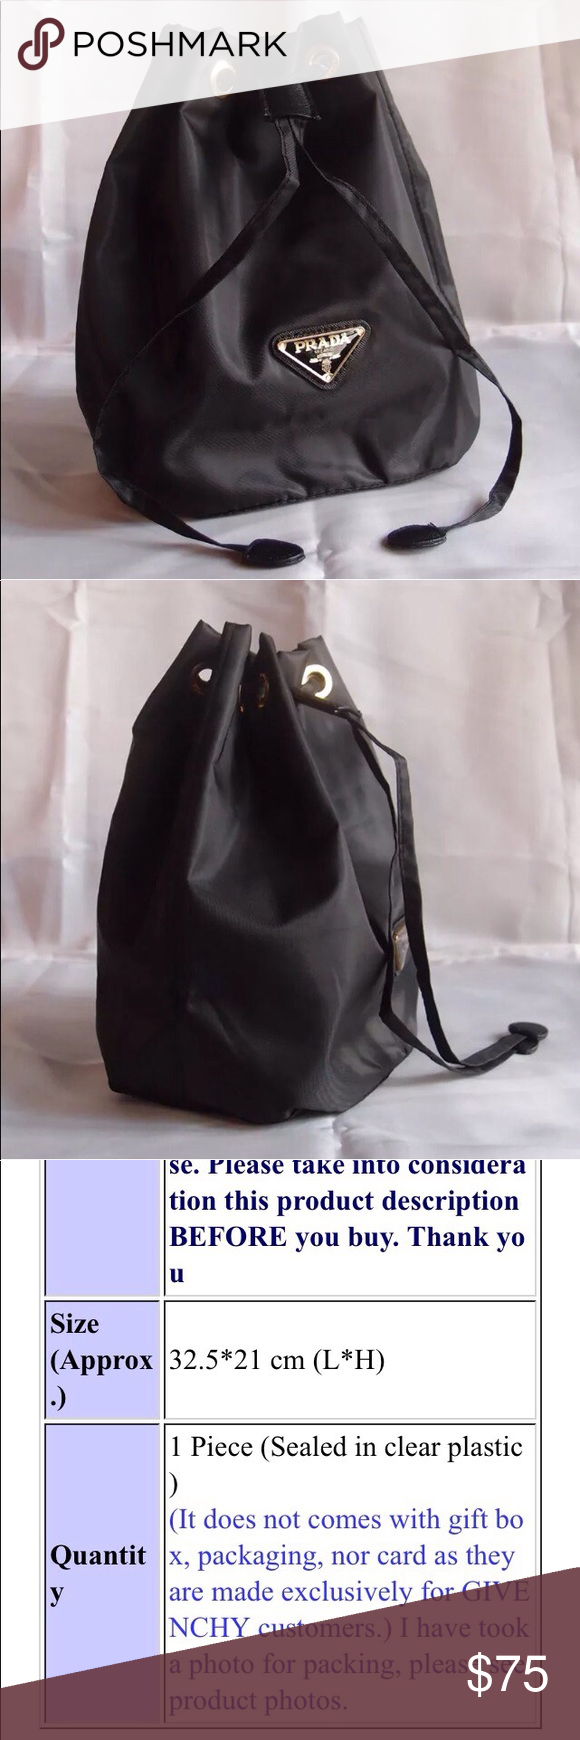 PRADA Parfums VIP Gift Cosmetic Nylon Bag Authentic VIP Gift- Black  drawstring nylon purse, cosmetic  makeup pouch Size  28x13.5x23.5 cm  (LxWxH) Prada Bags ... 4b0a3a5c94